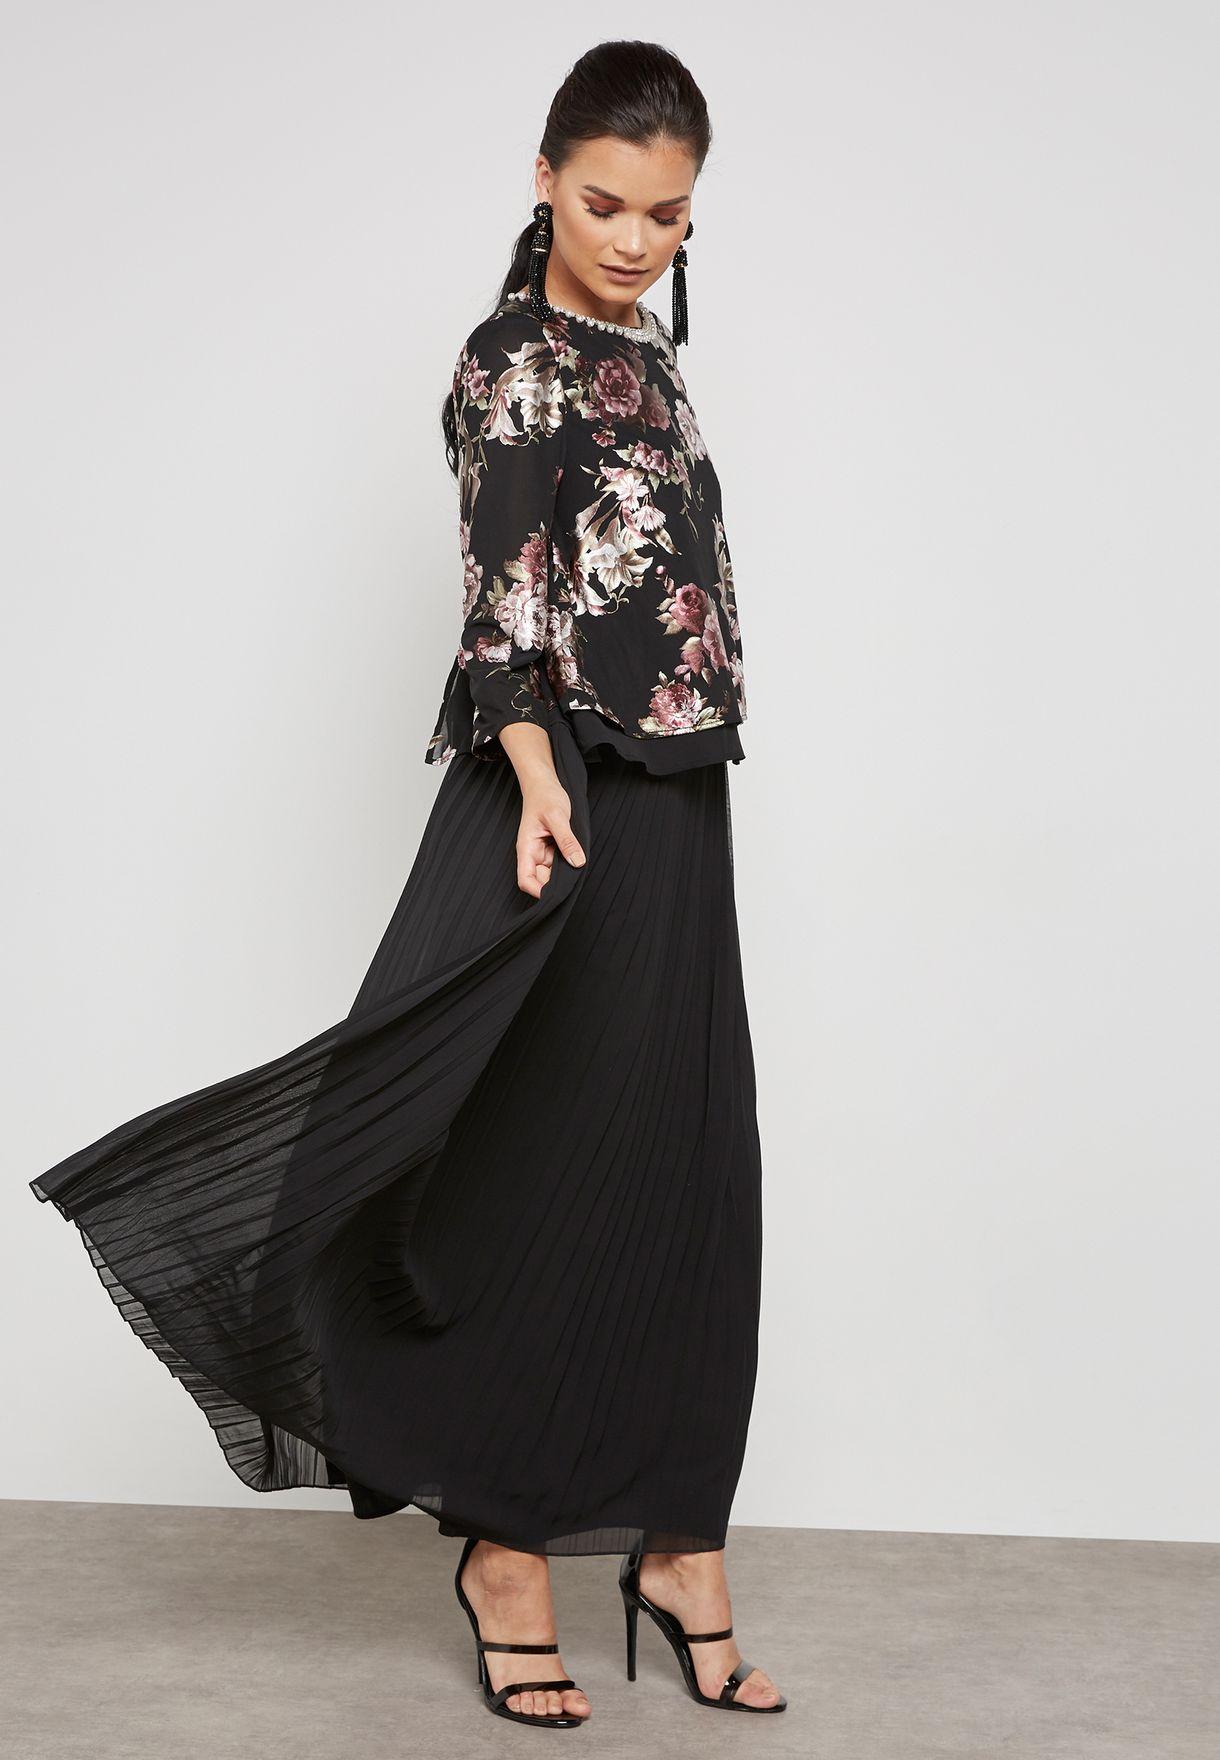 eef74d473 Shop Anotah black Floral Print Pleated Skirt Dress 18HSDRE-L301243 ...